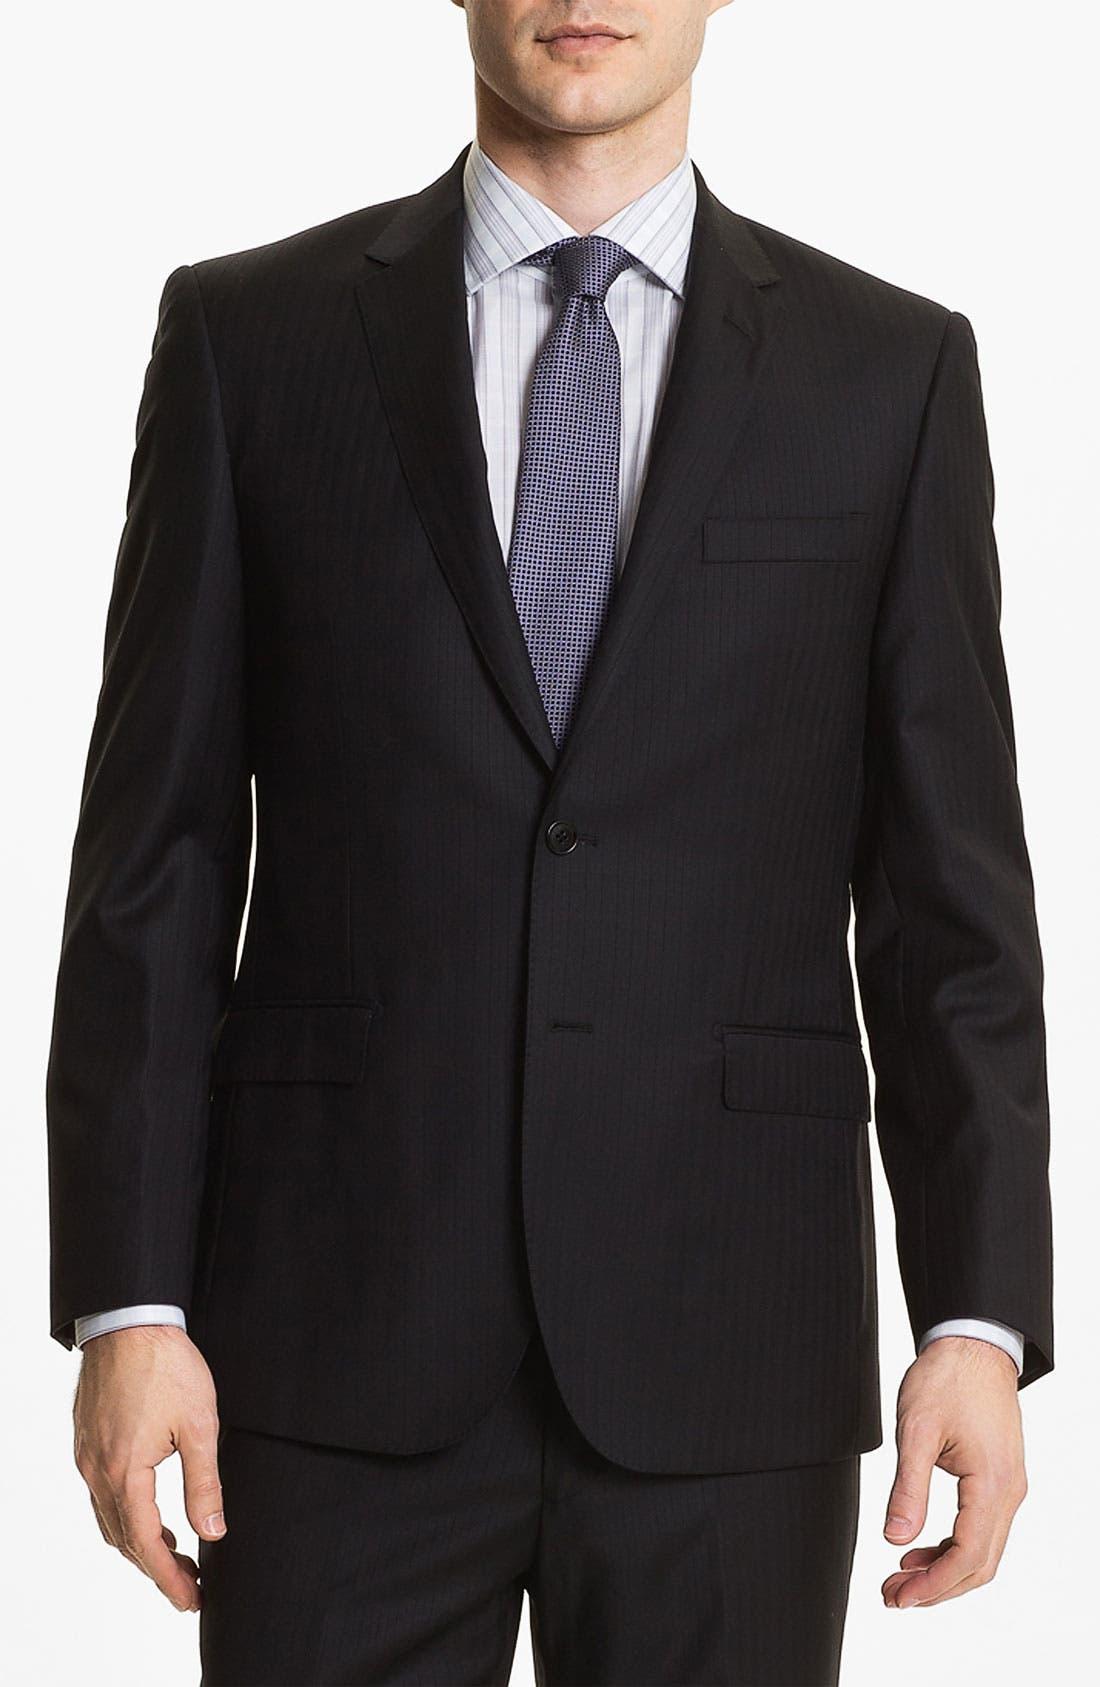 Main Image - English Laundry Trim Fit Stripe Suit (Online Only)